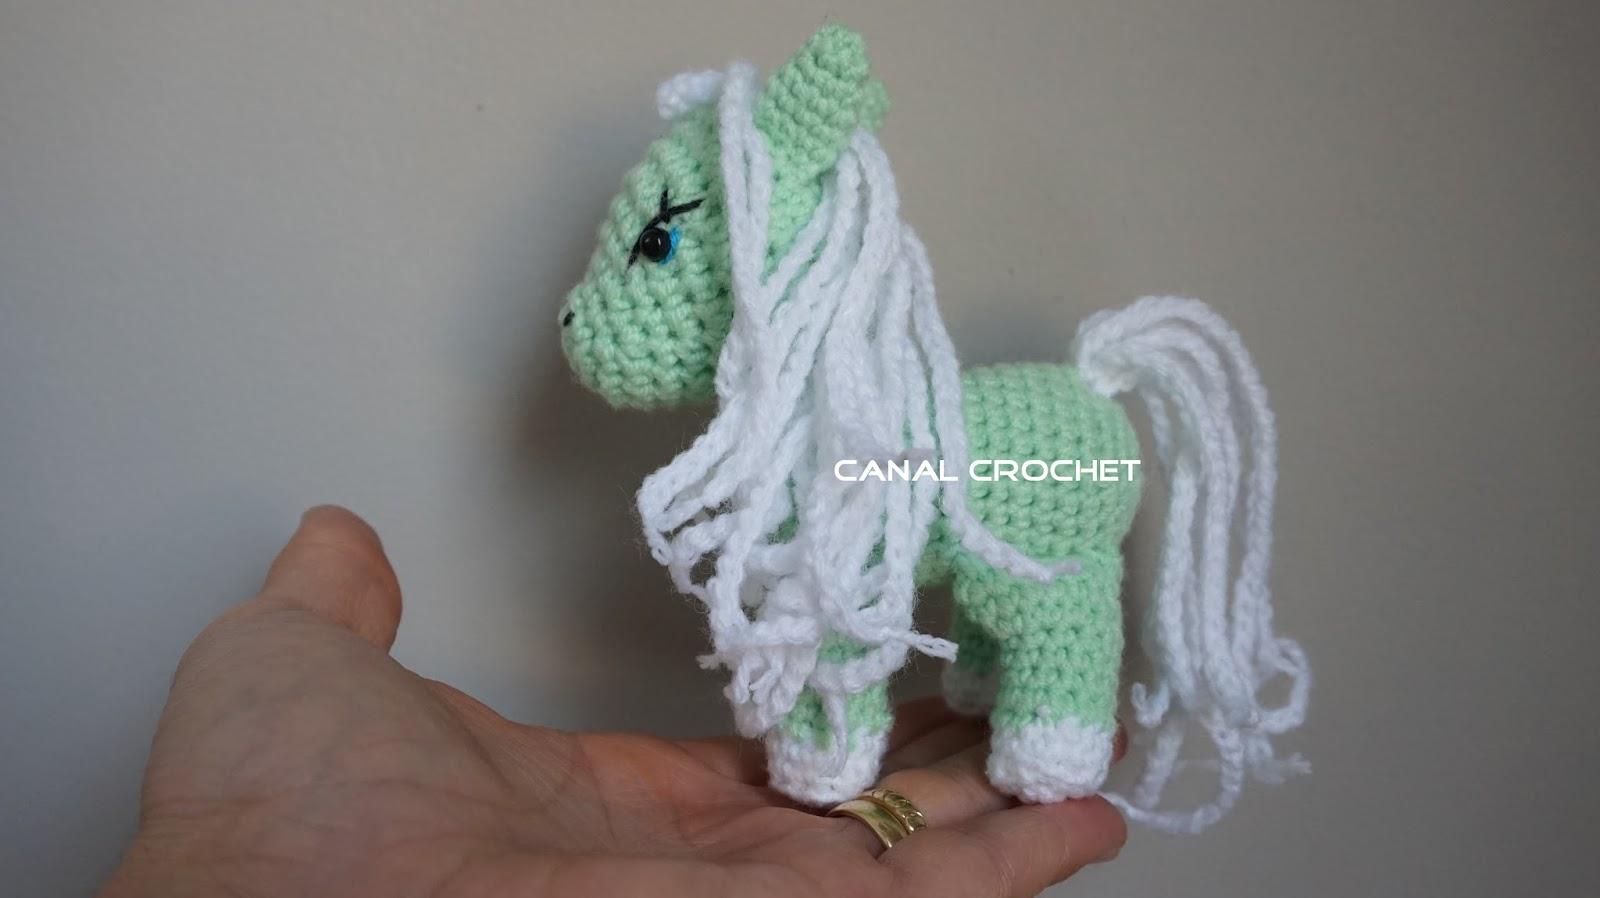 CANAL CROCHET: Pony amigurumi tutorial